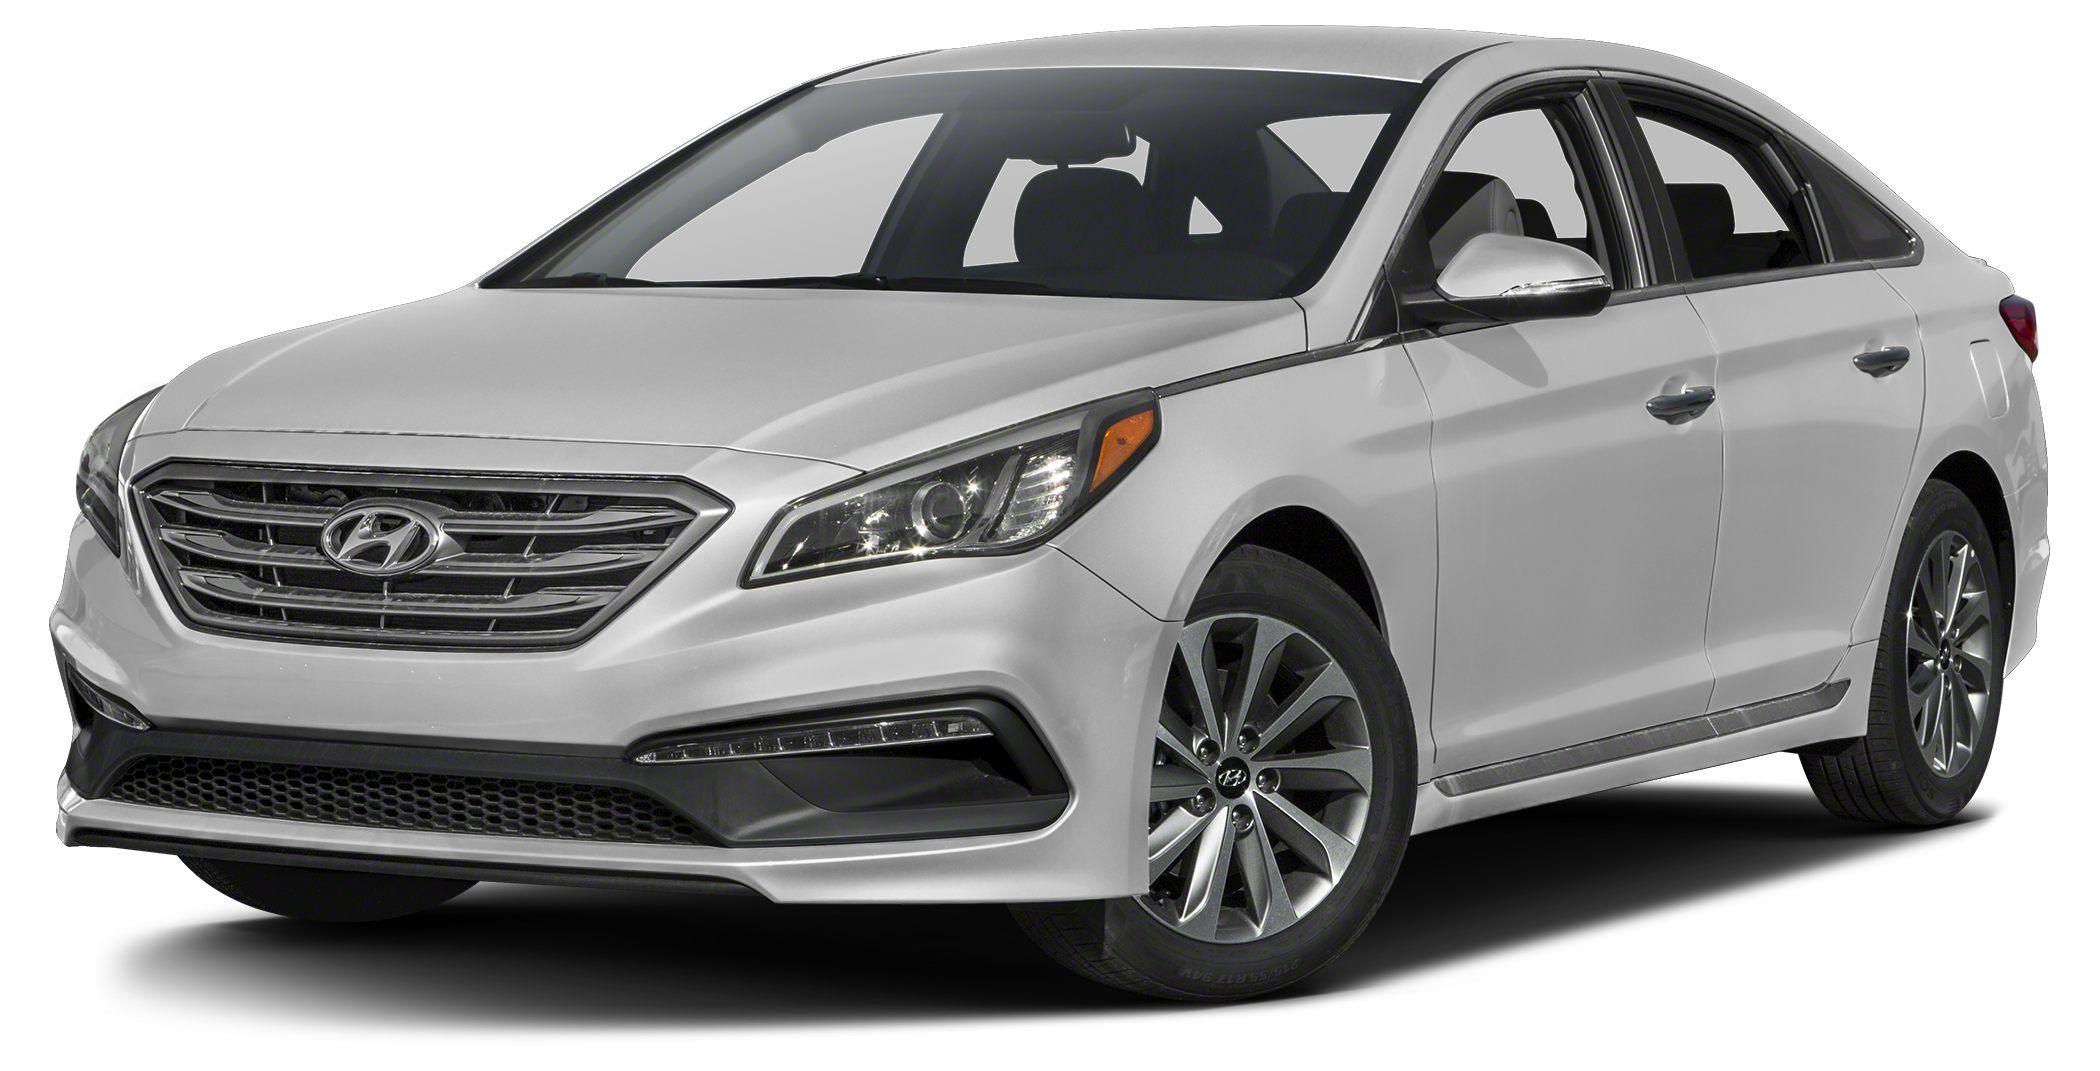 2017 Hyundai Sonata Sport Bluetooth Miles 10Color Symphony Silver Stock 15362 VIN 5NPE34AF2